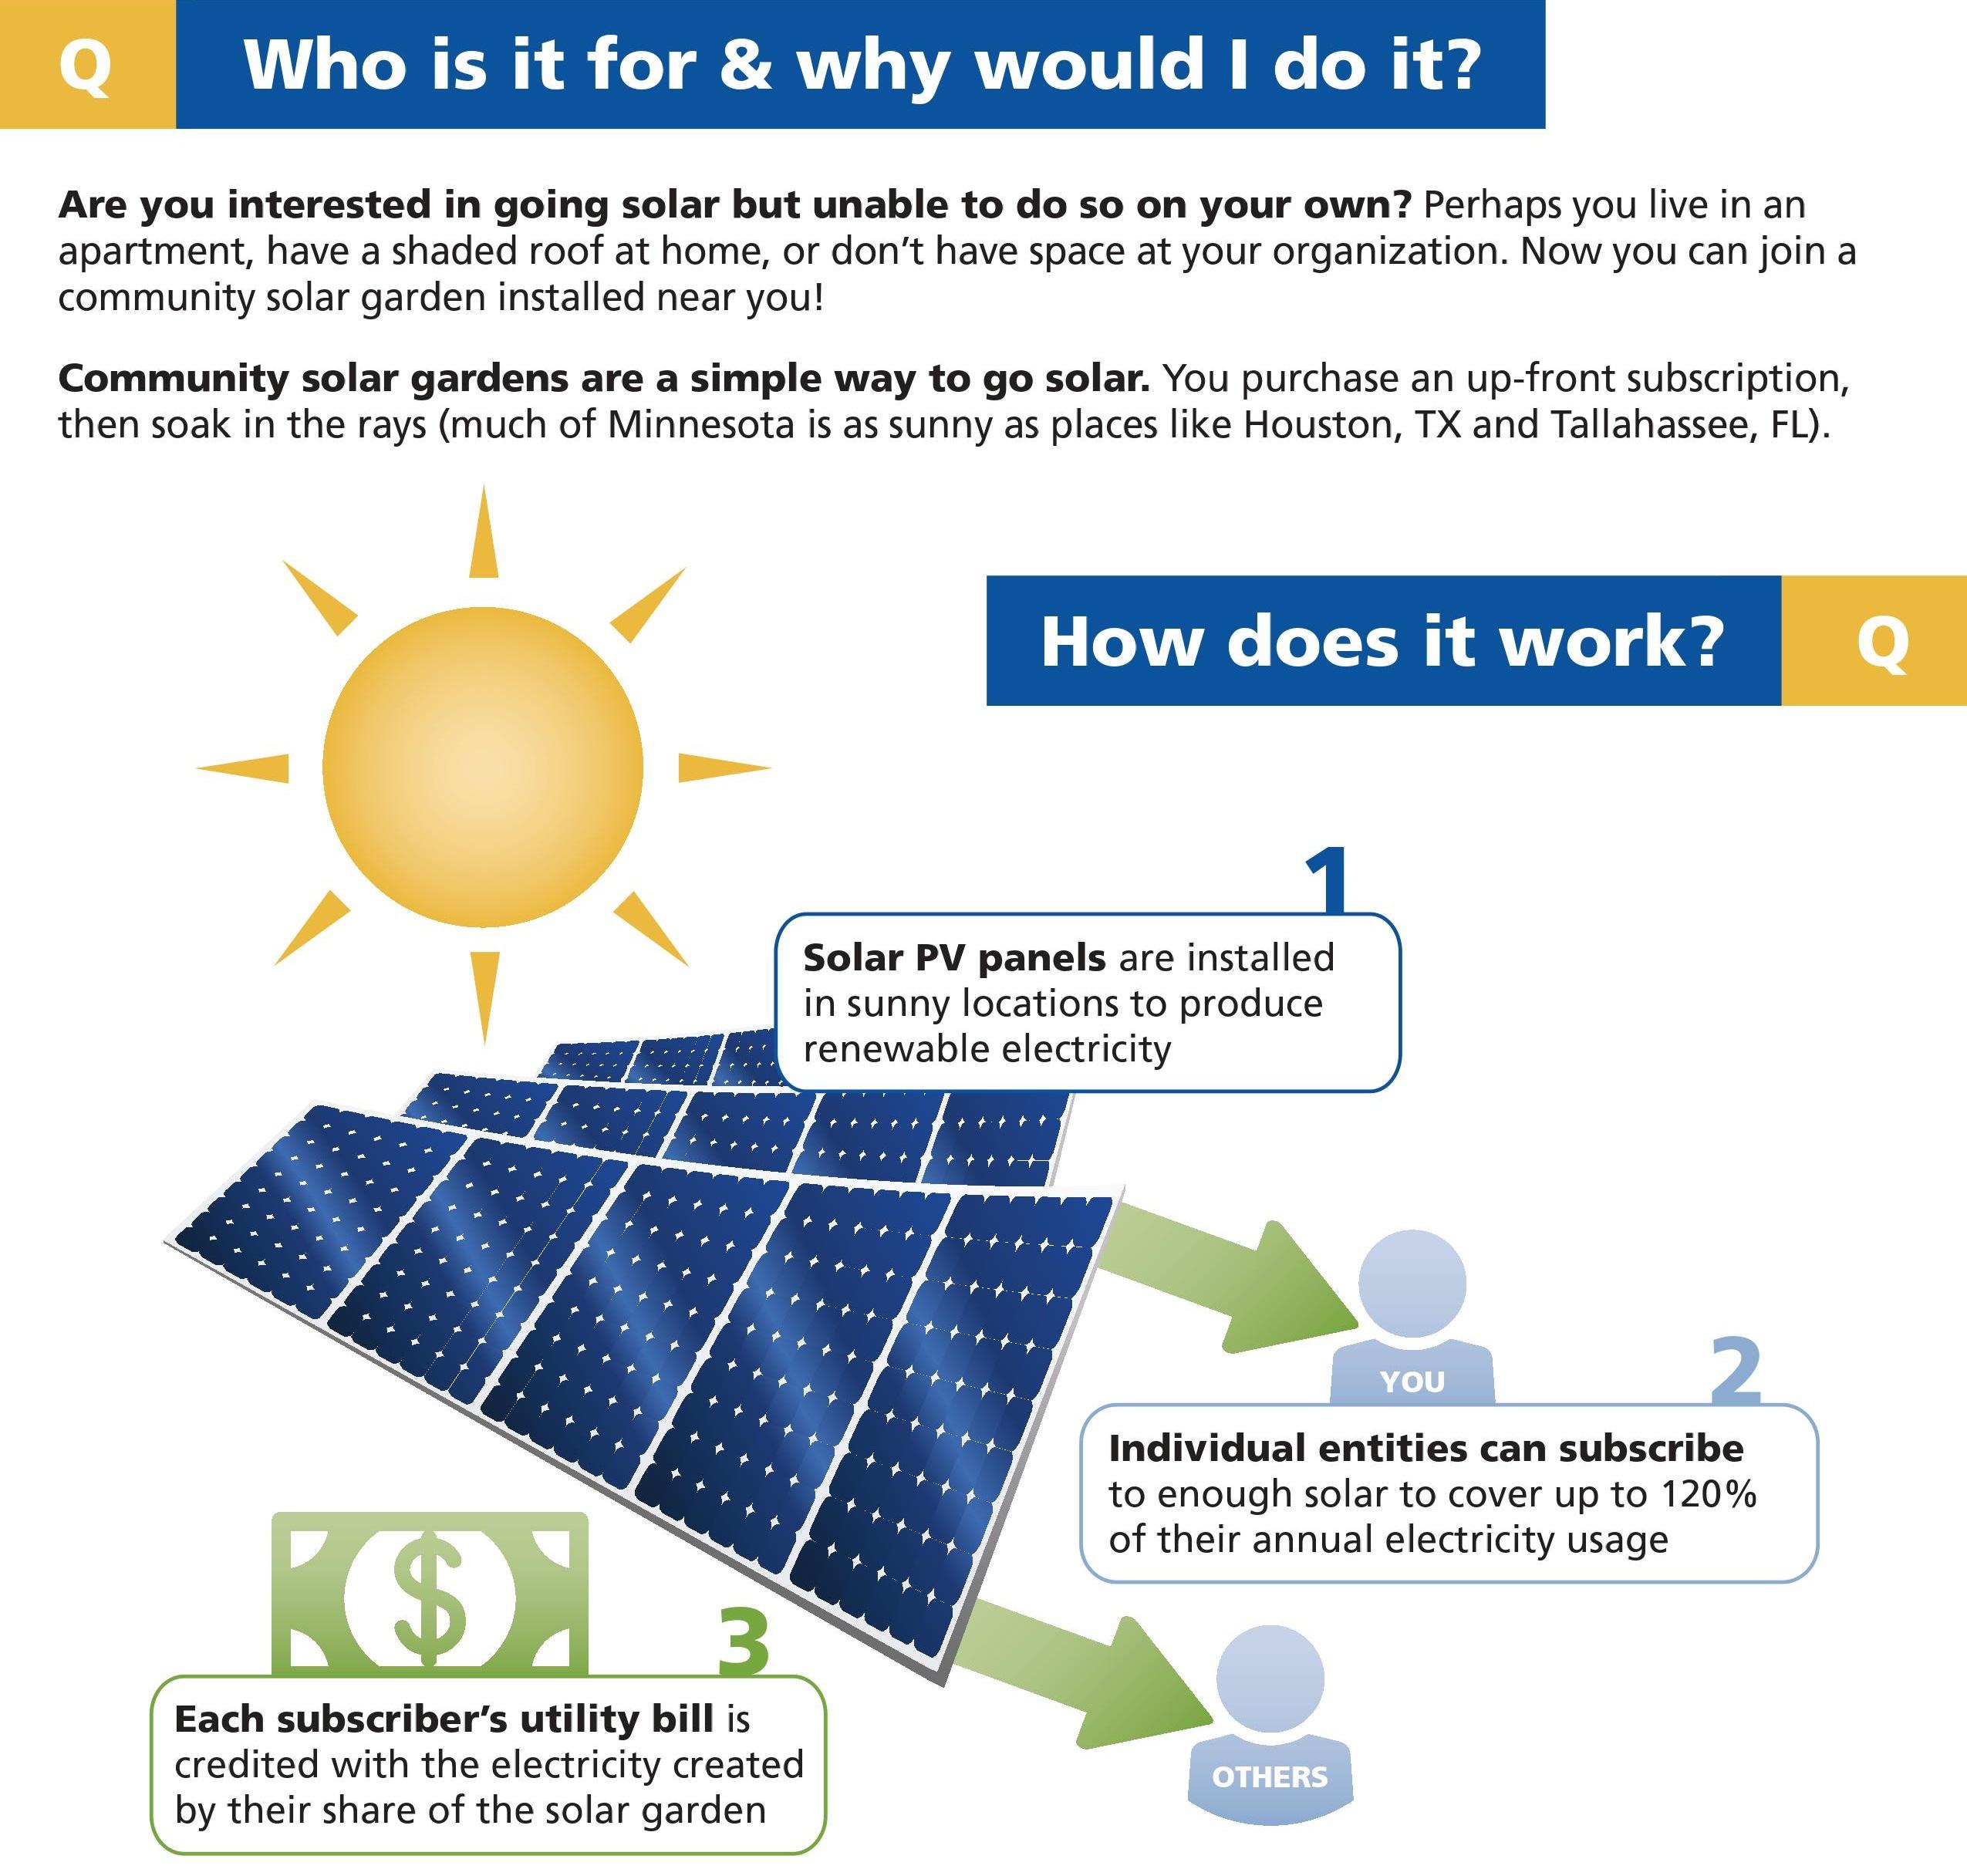 community_solar_garden_1.jpg